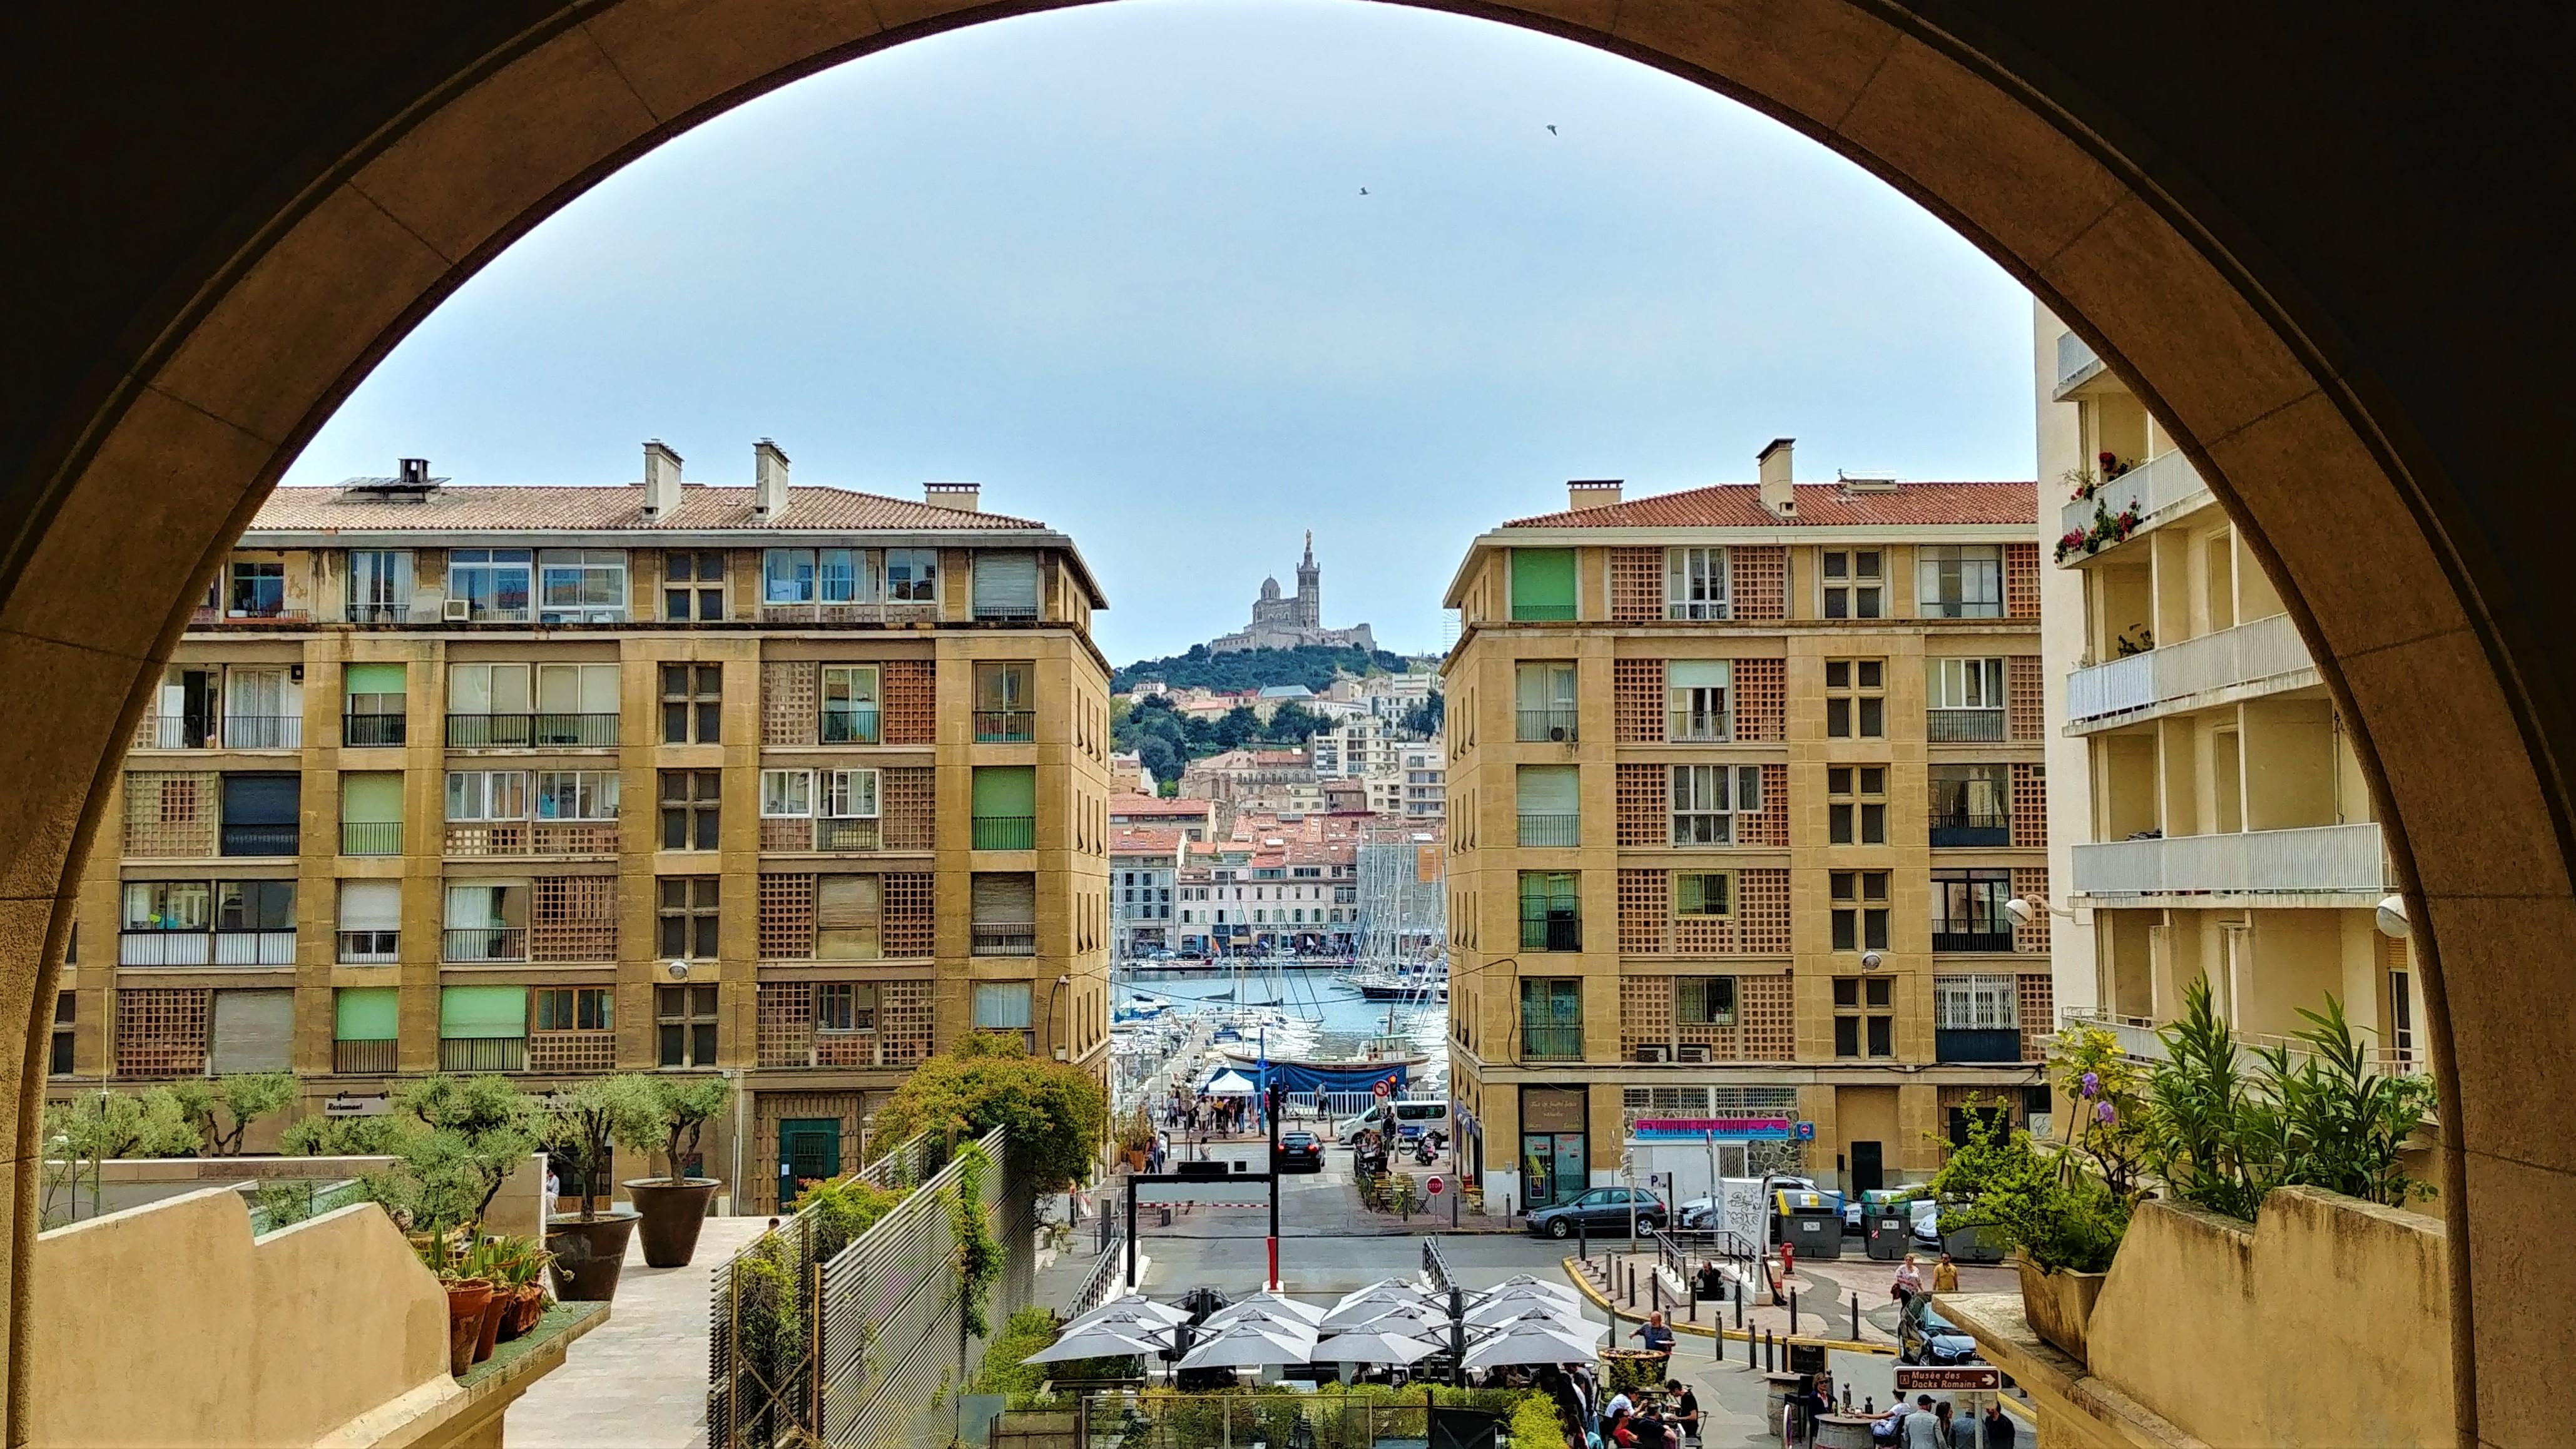 marseille vieux-port visiter blog voyage provence arpenter le chemin